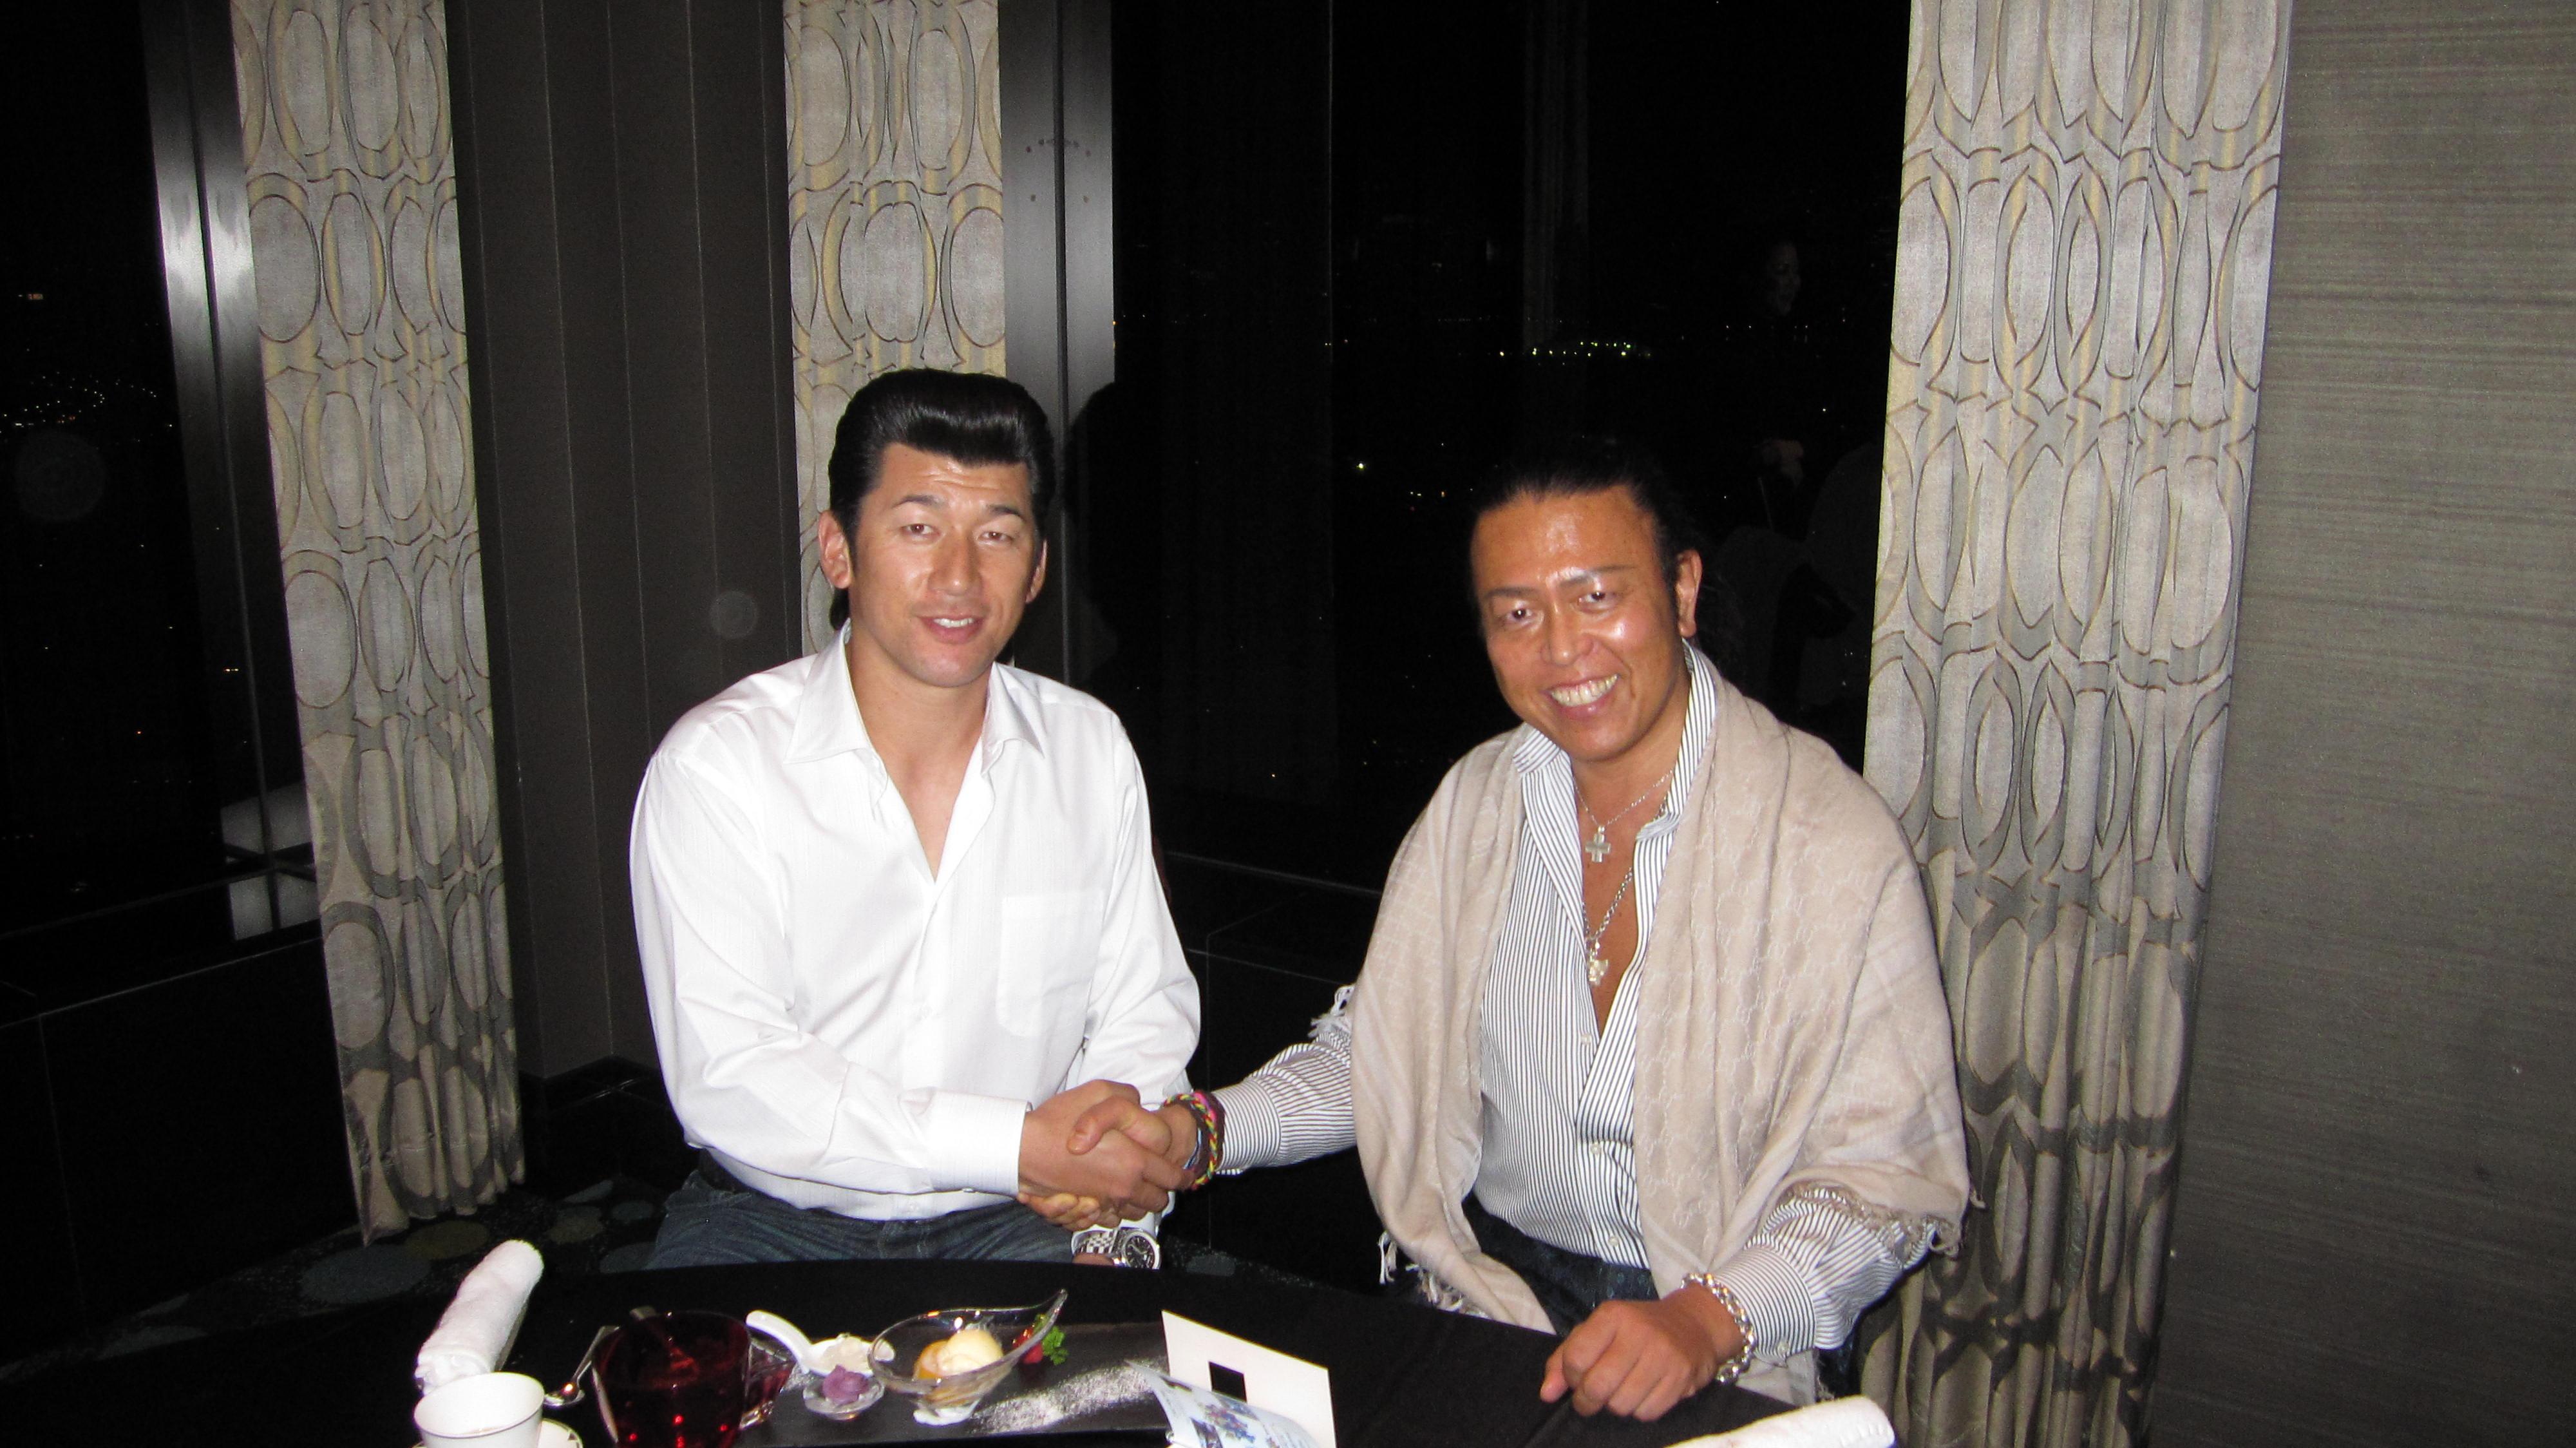 番長と握手.JPG